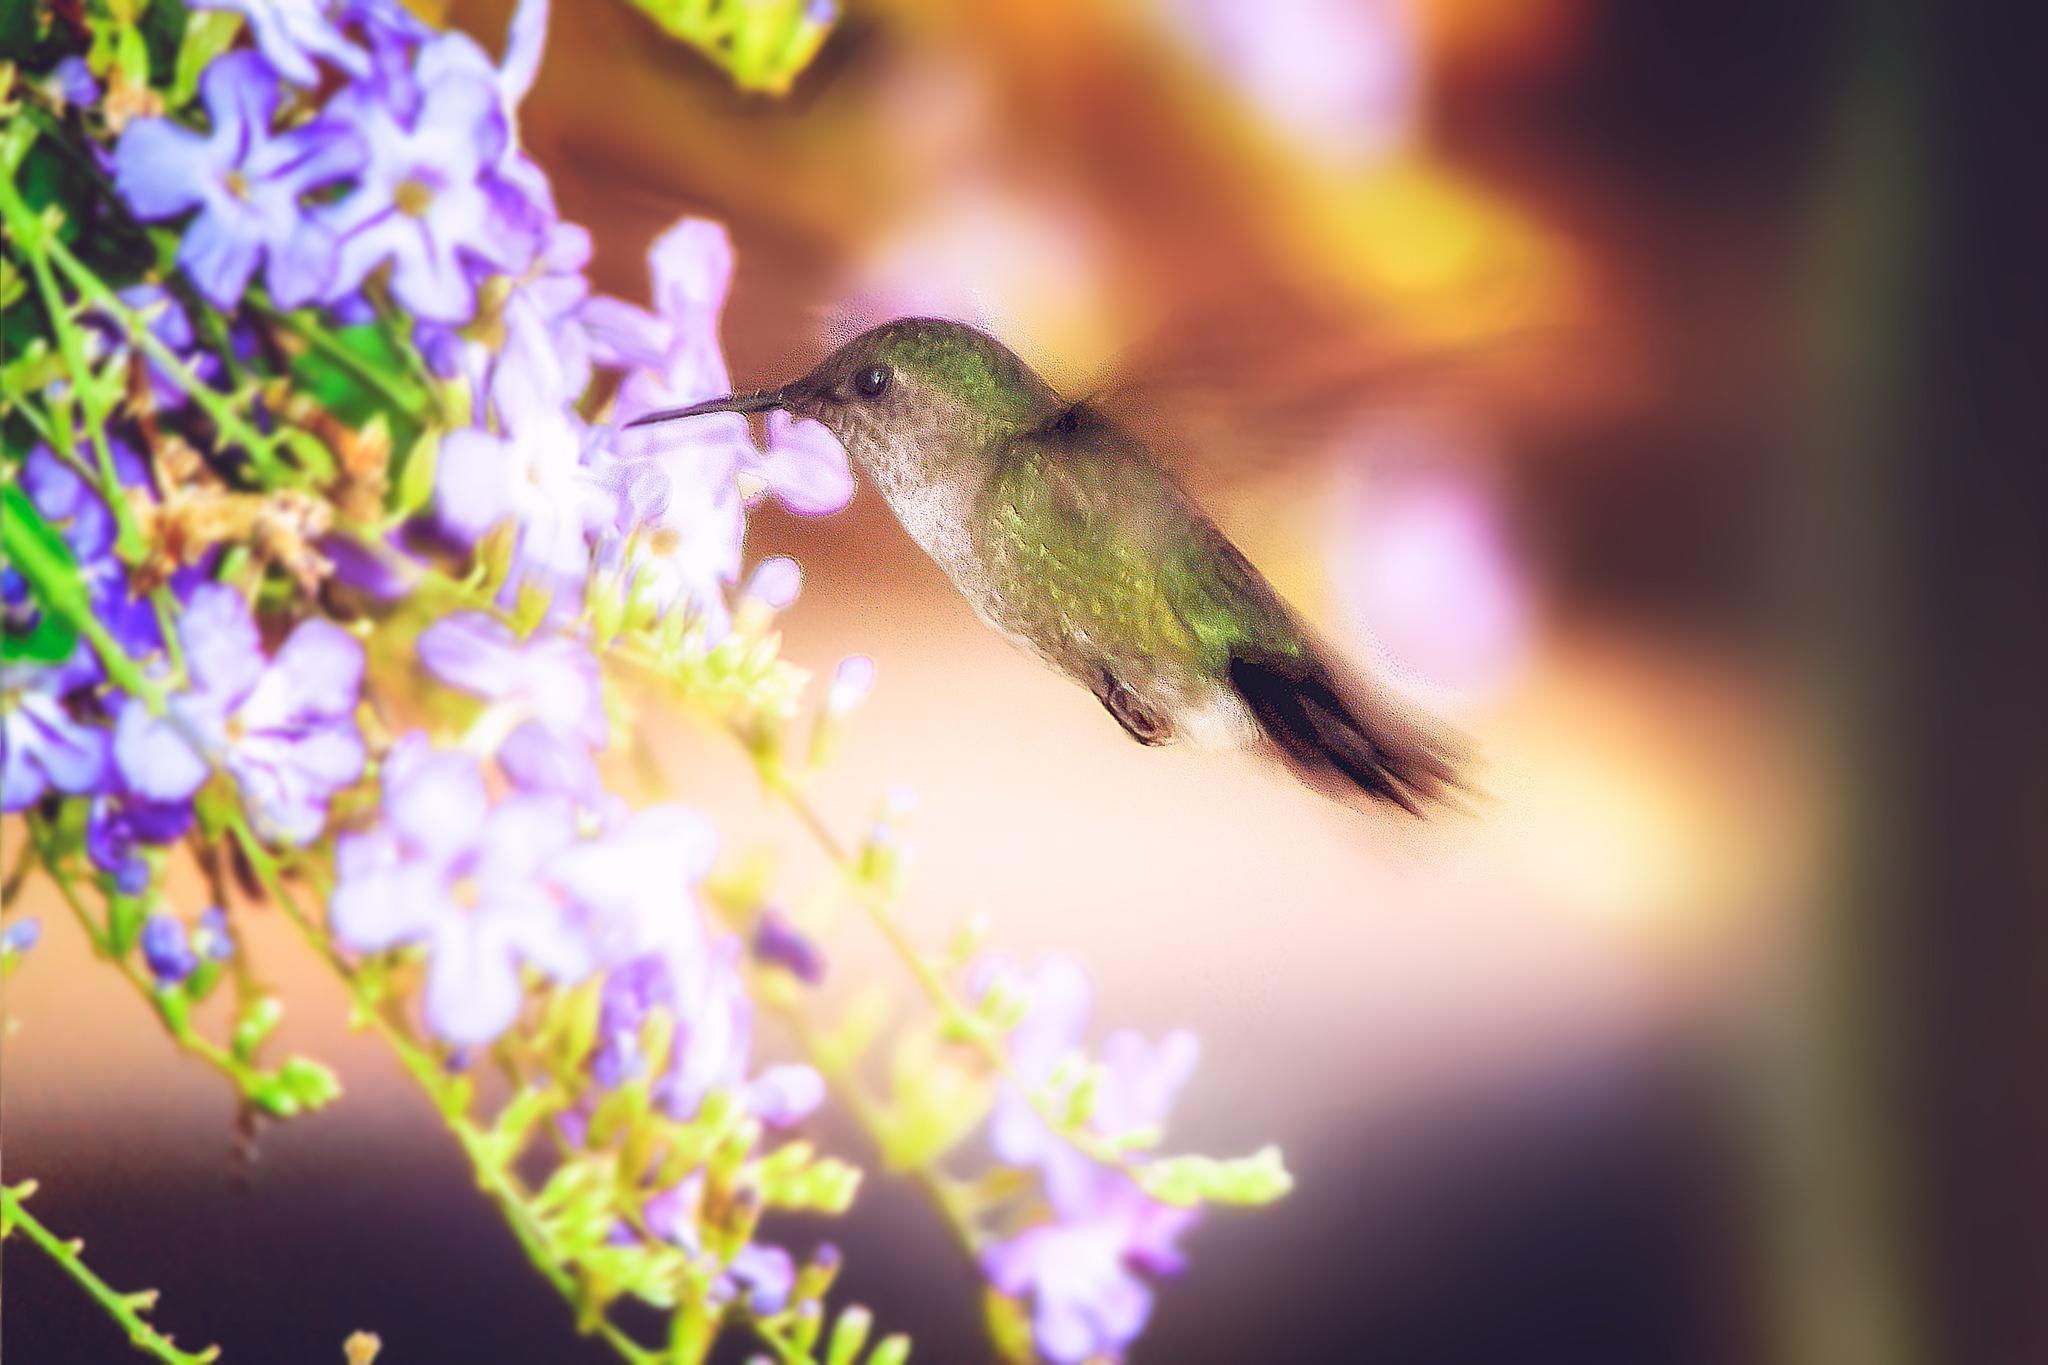 Hummingbird 16 by Tony Guzman